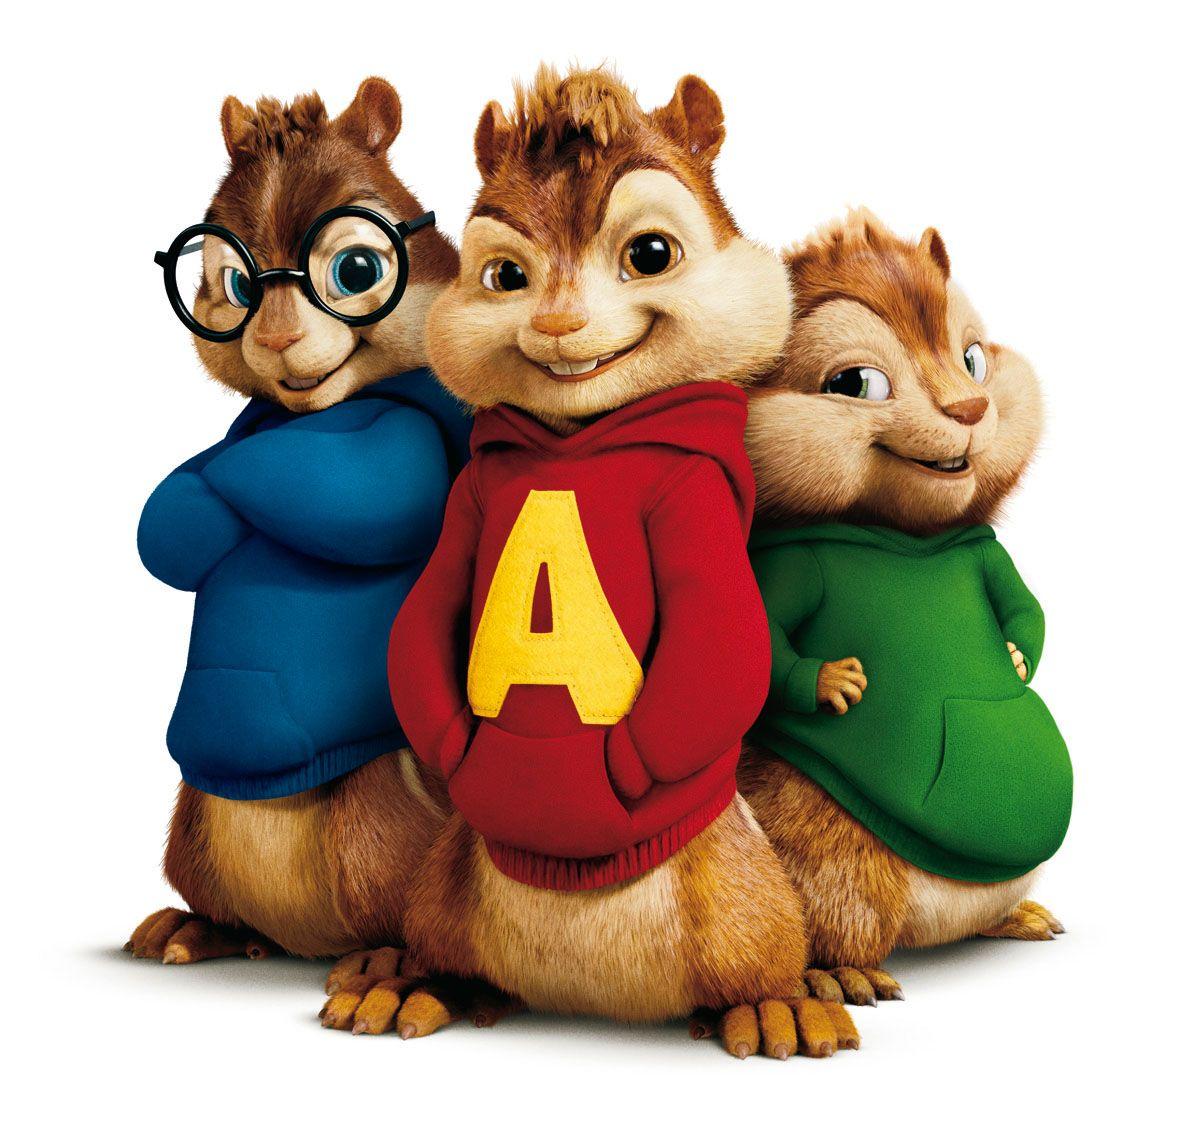 Ross Bagdasarian S Alvin And The Chipmunks Com Imagens Alvin